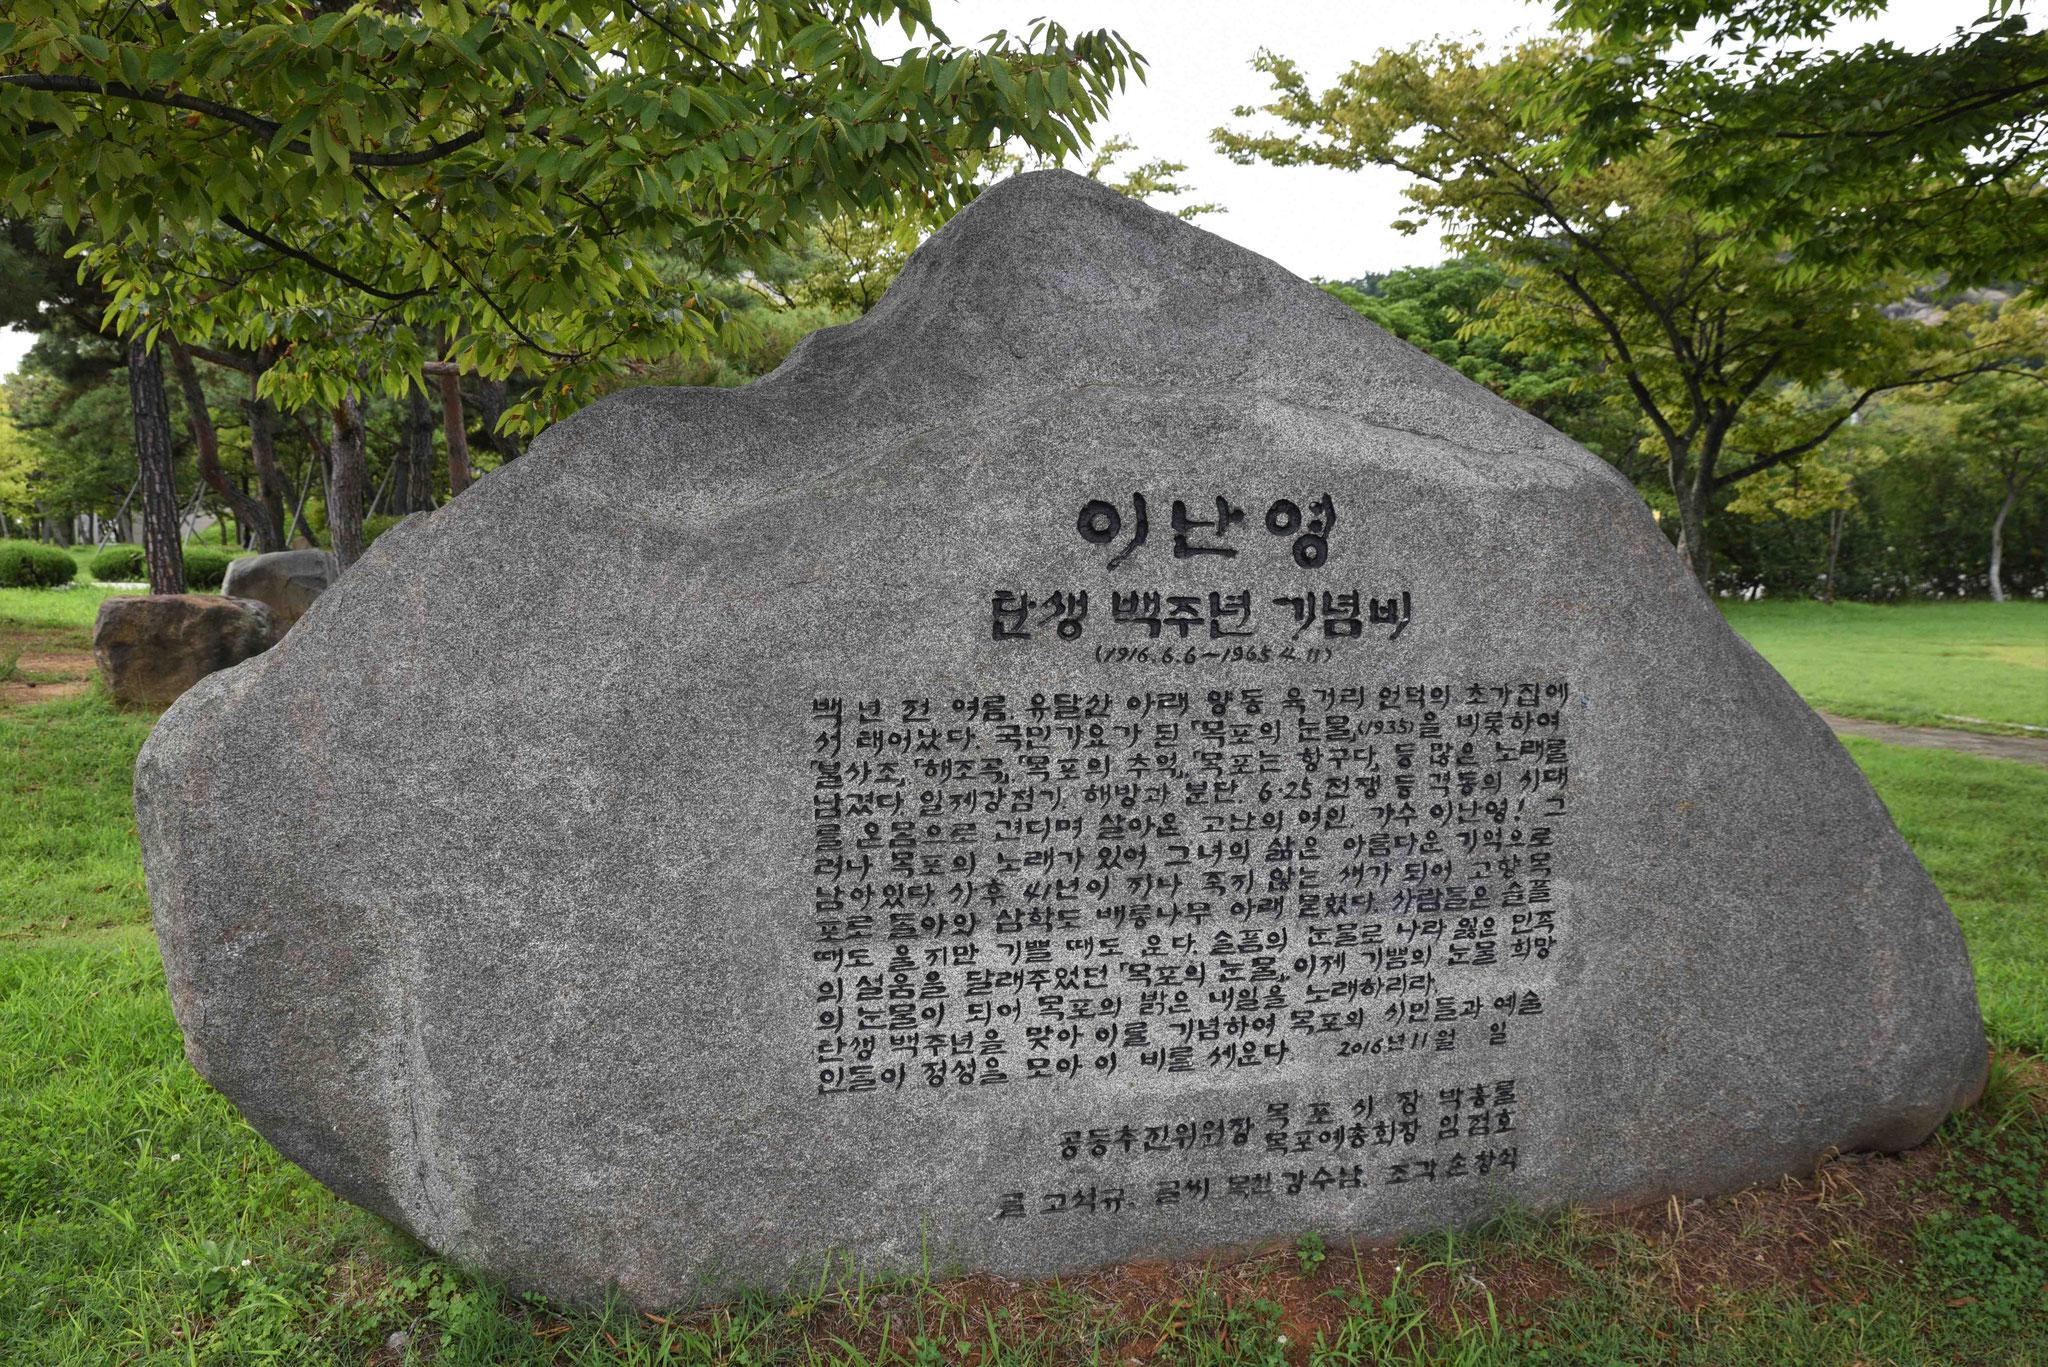 Obelix im Land der Koreaner?